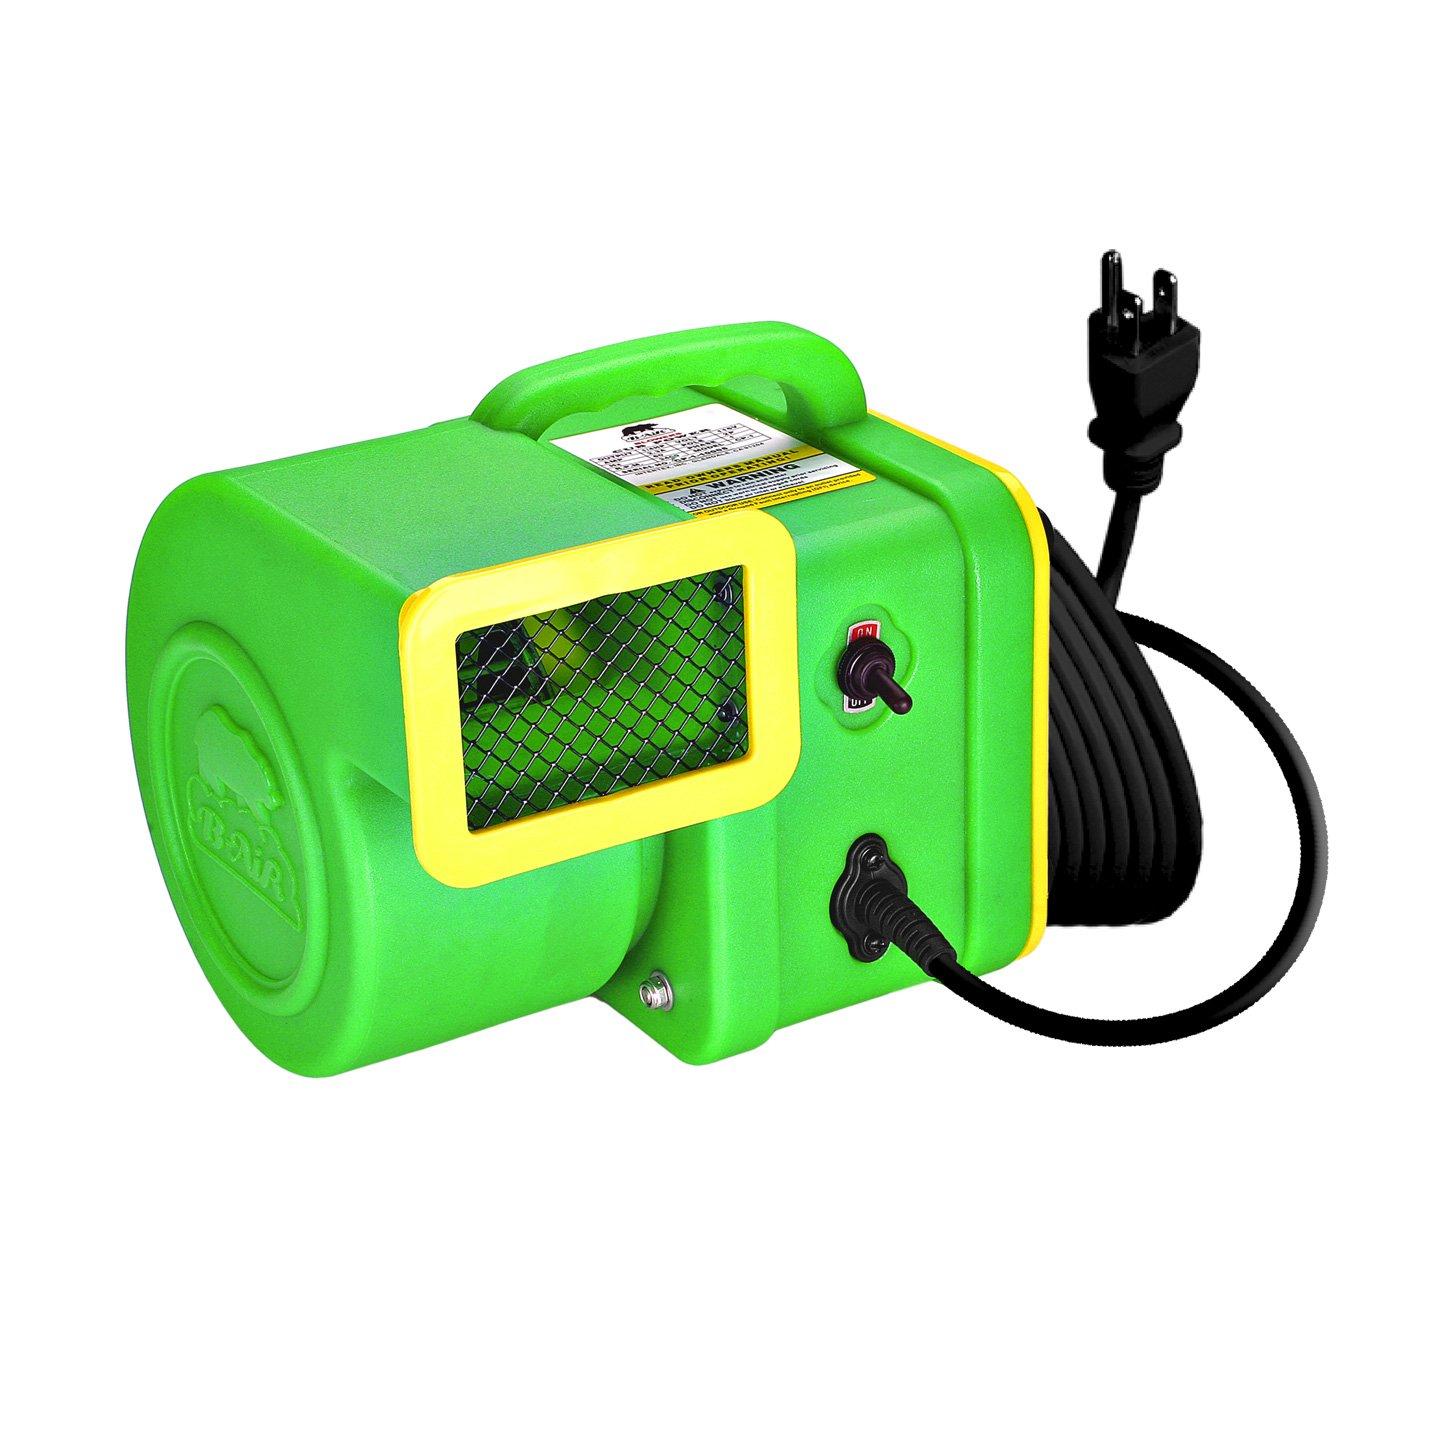 B-Air Pet Dryer Airmovers CP-1 ETL G B-Air CUB ETL Approved Pet Dryer Airmover